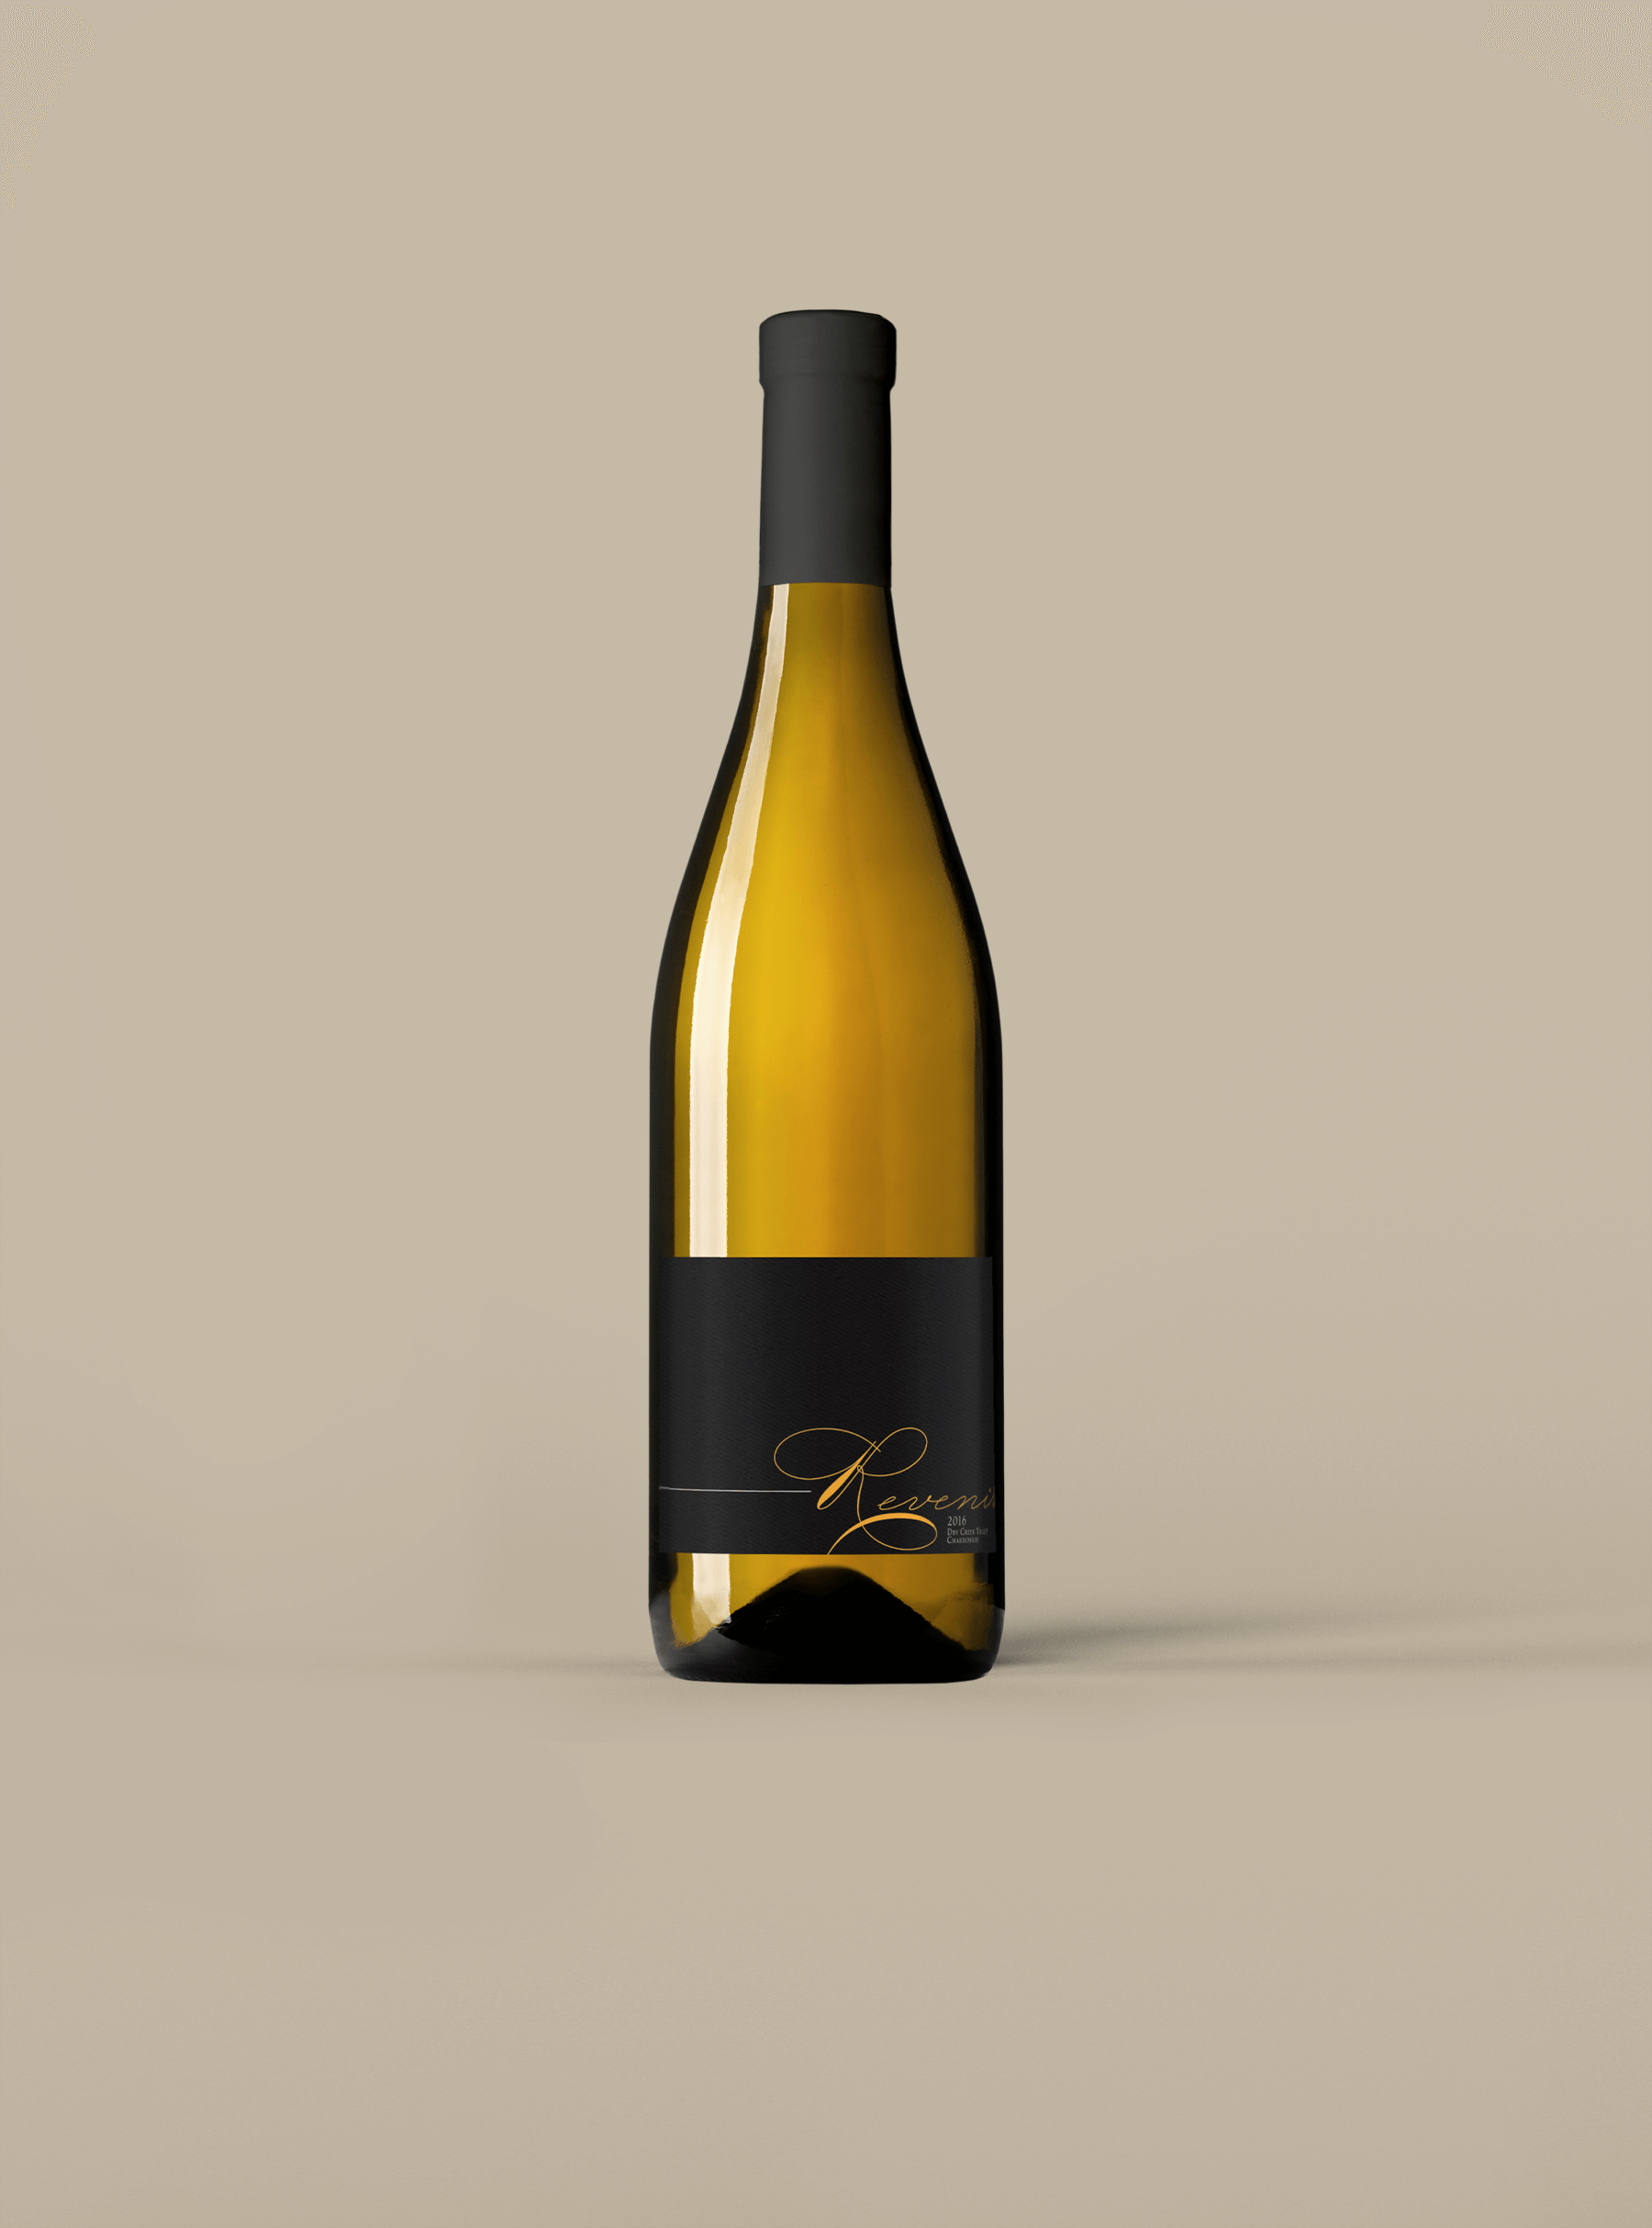 Revenir Dry Creek Valley Chardonnay